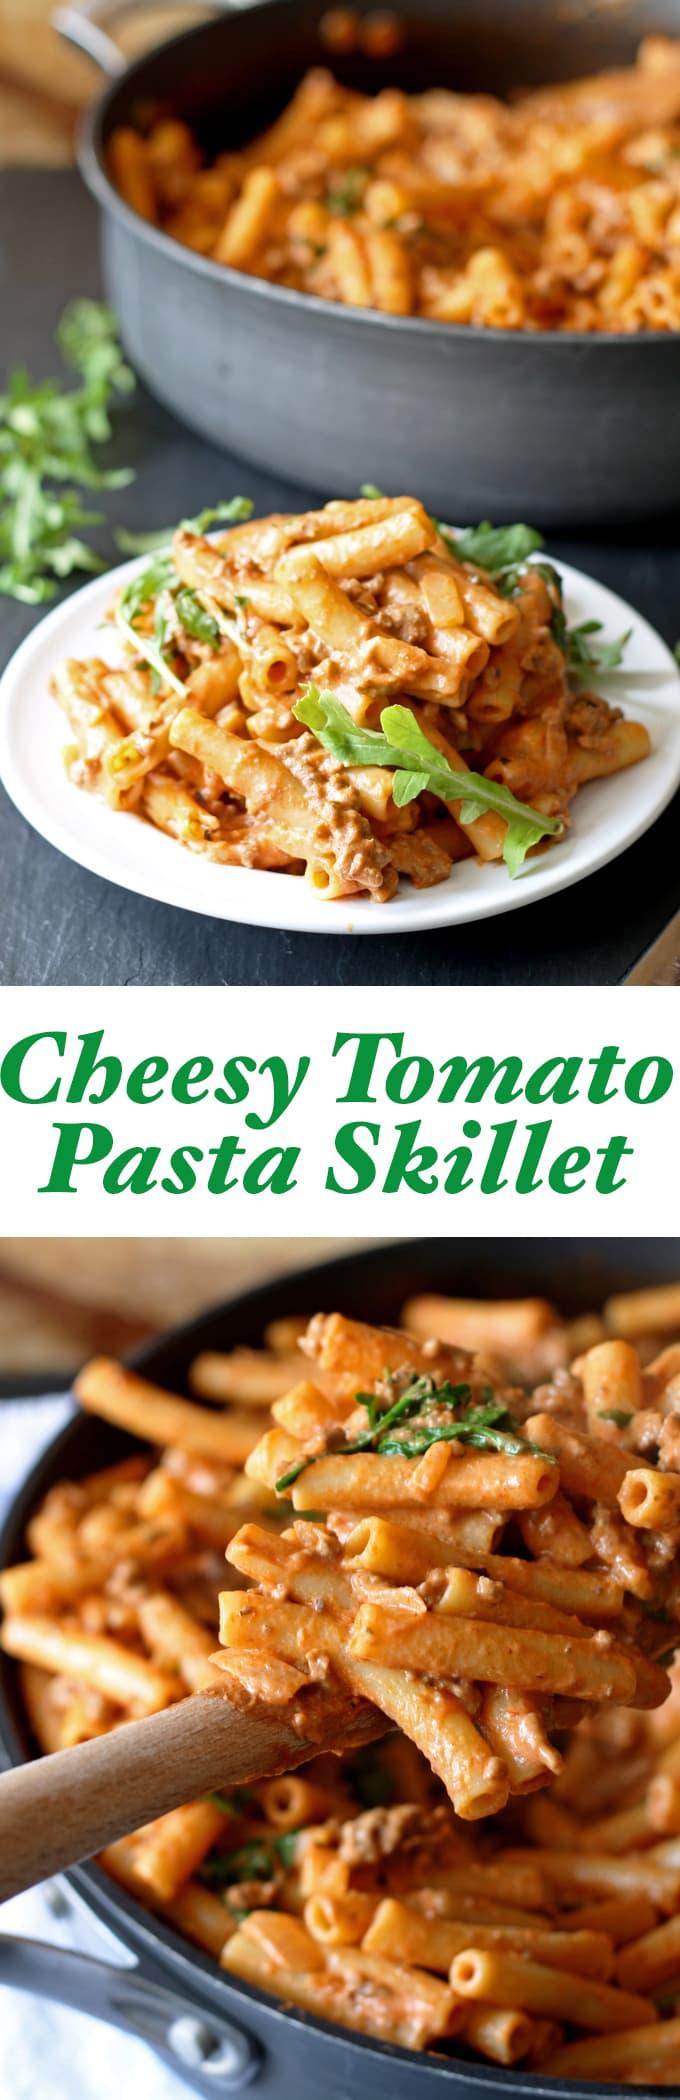 Cheesy Tomato Pasta Skillet | www.honeyandbirch.com | #dinner #sundaysupper #30minutemeal